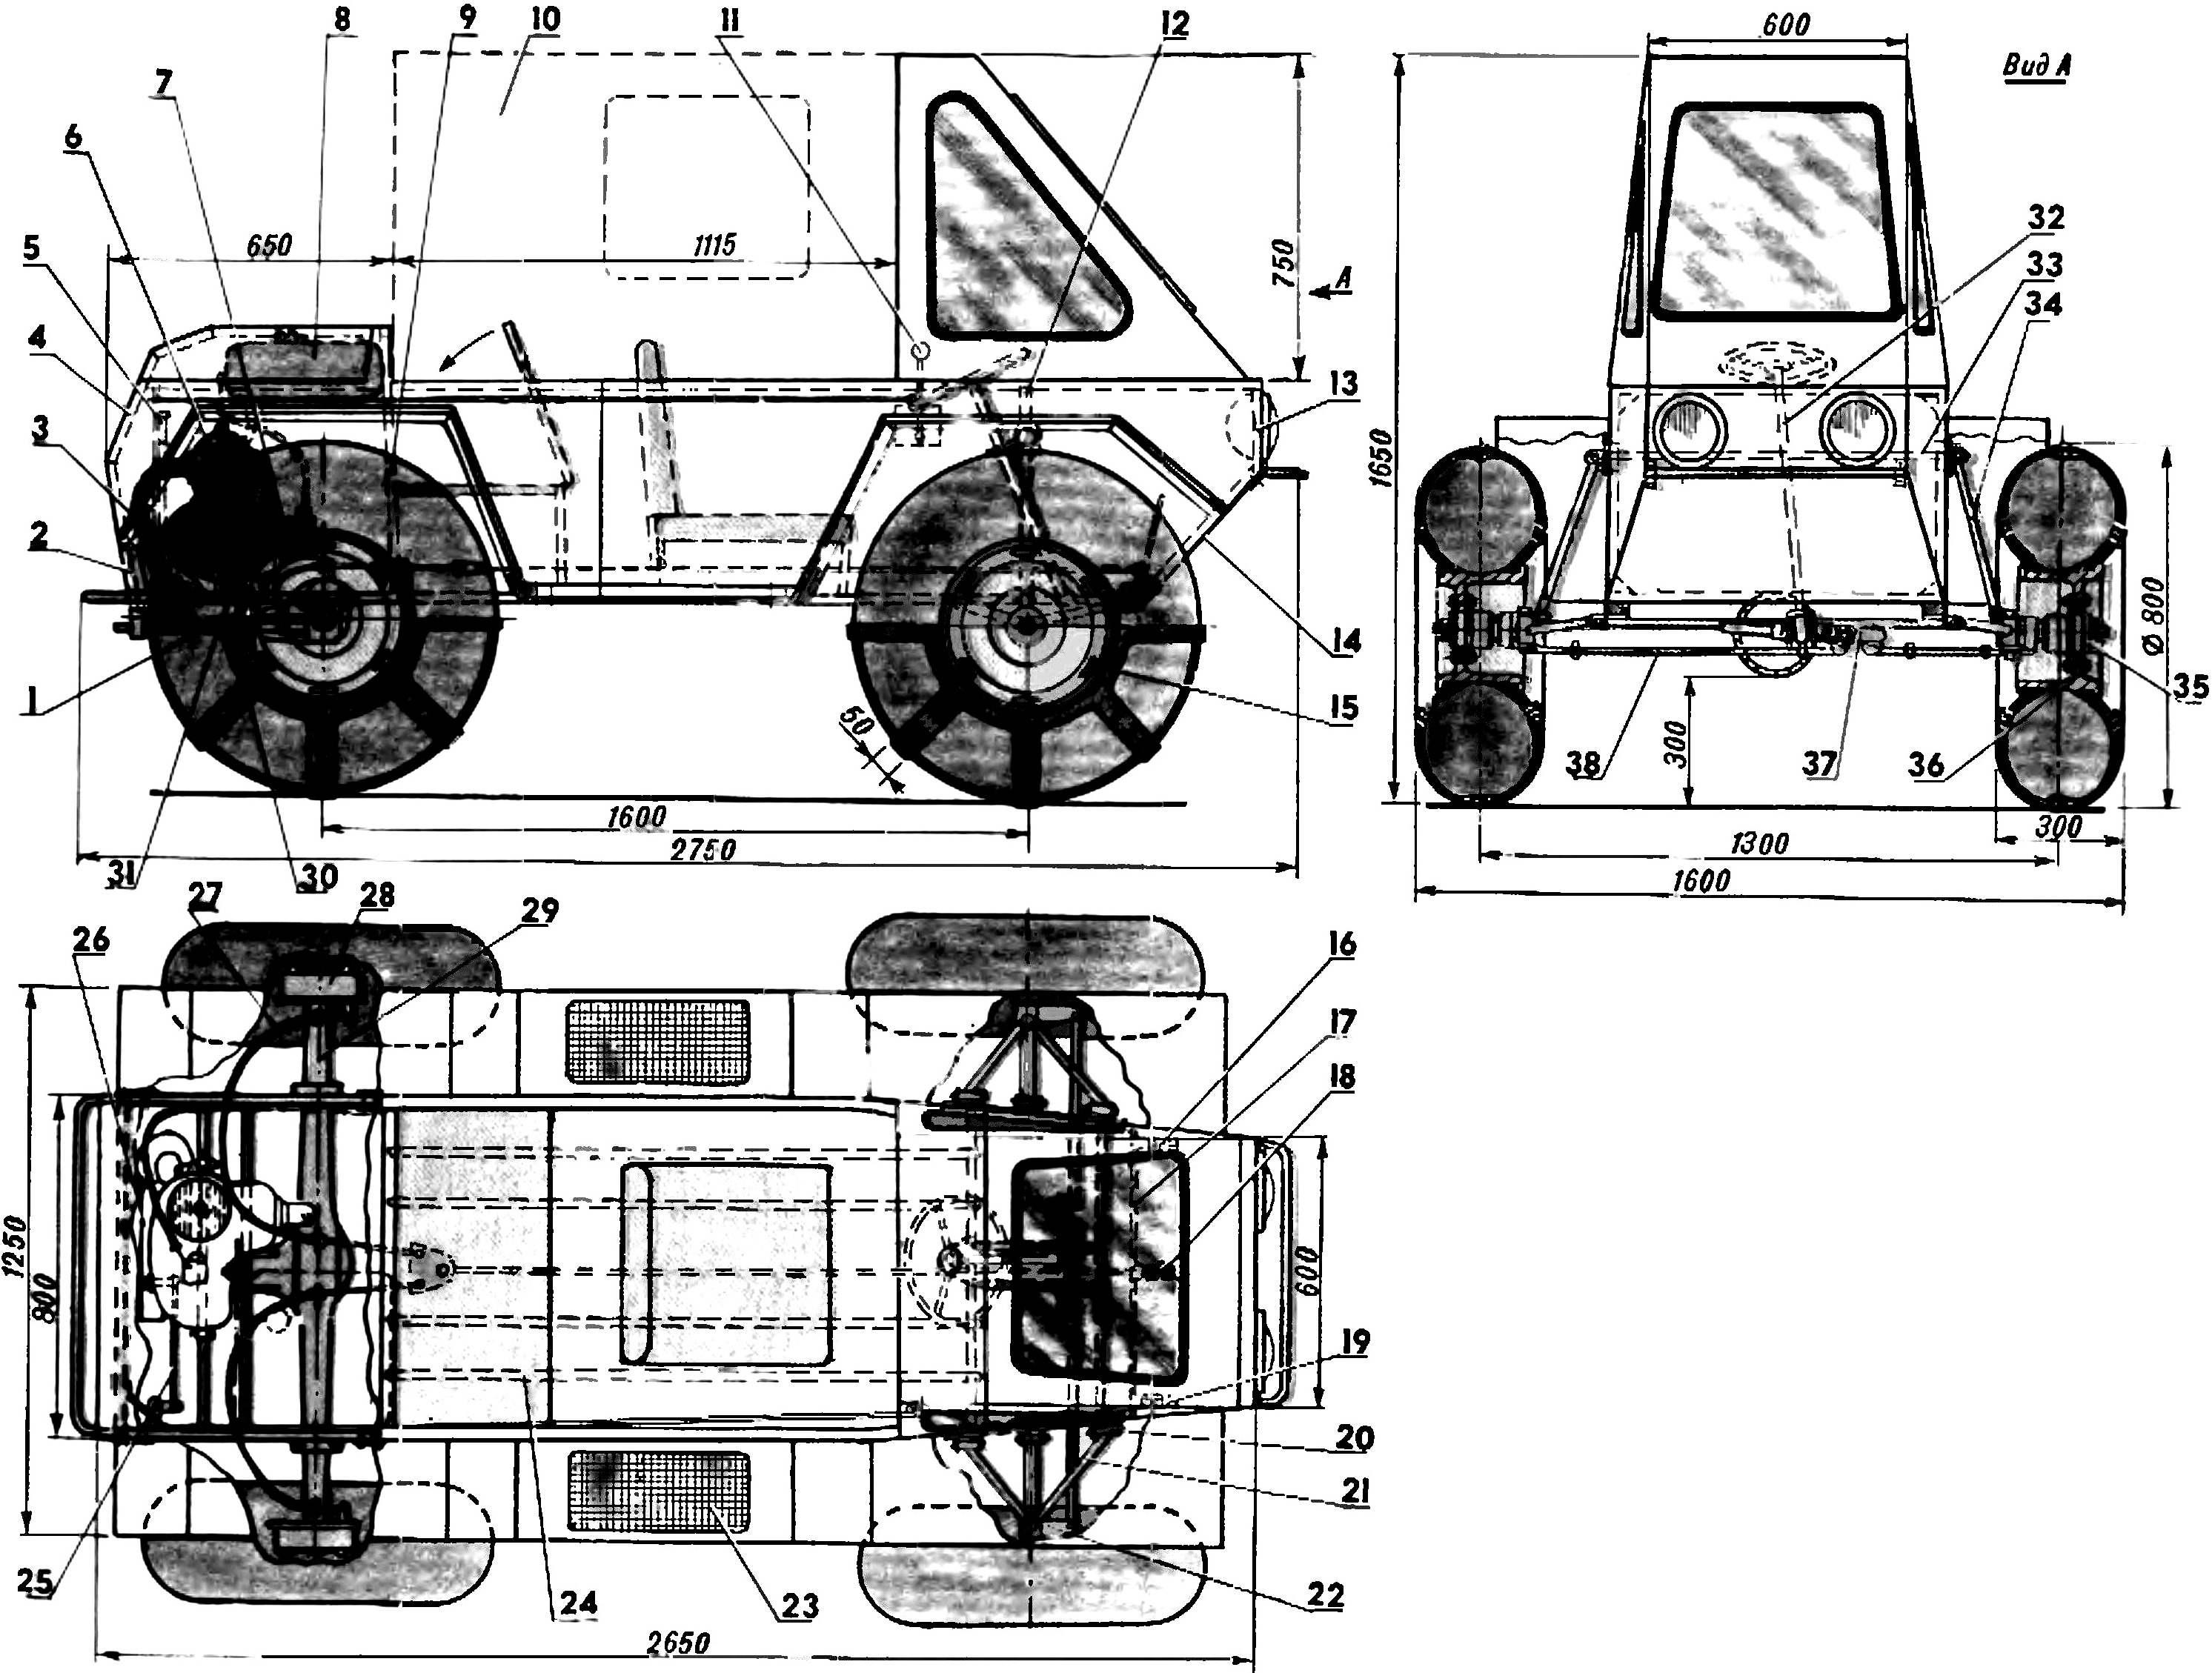 Fig. 1. All Terrain Vehicle